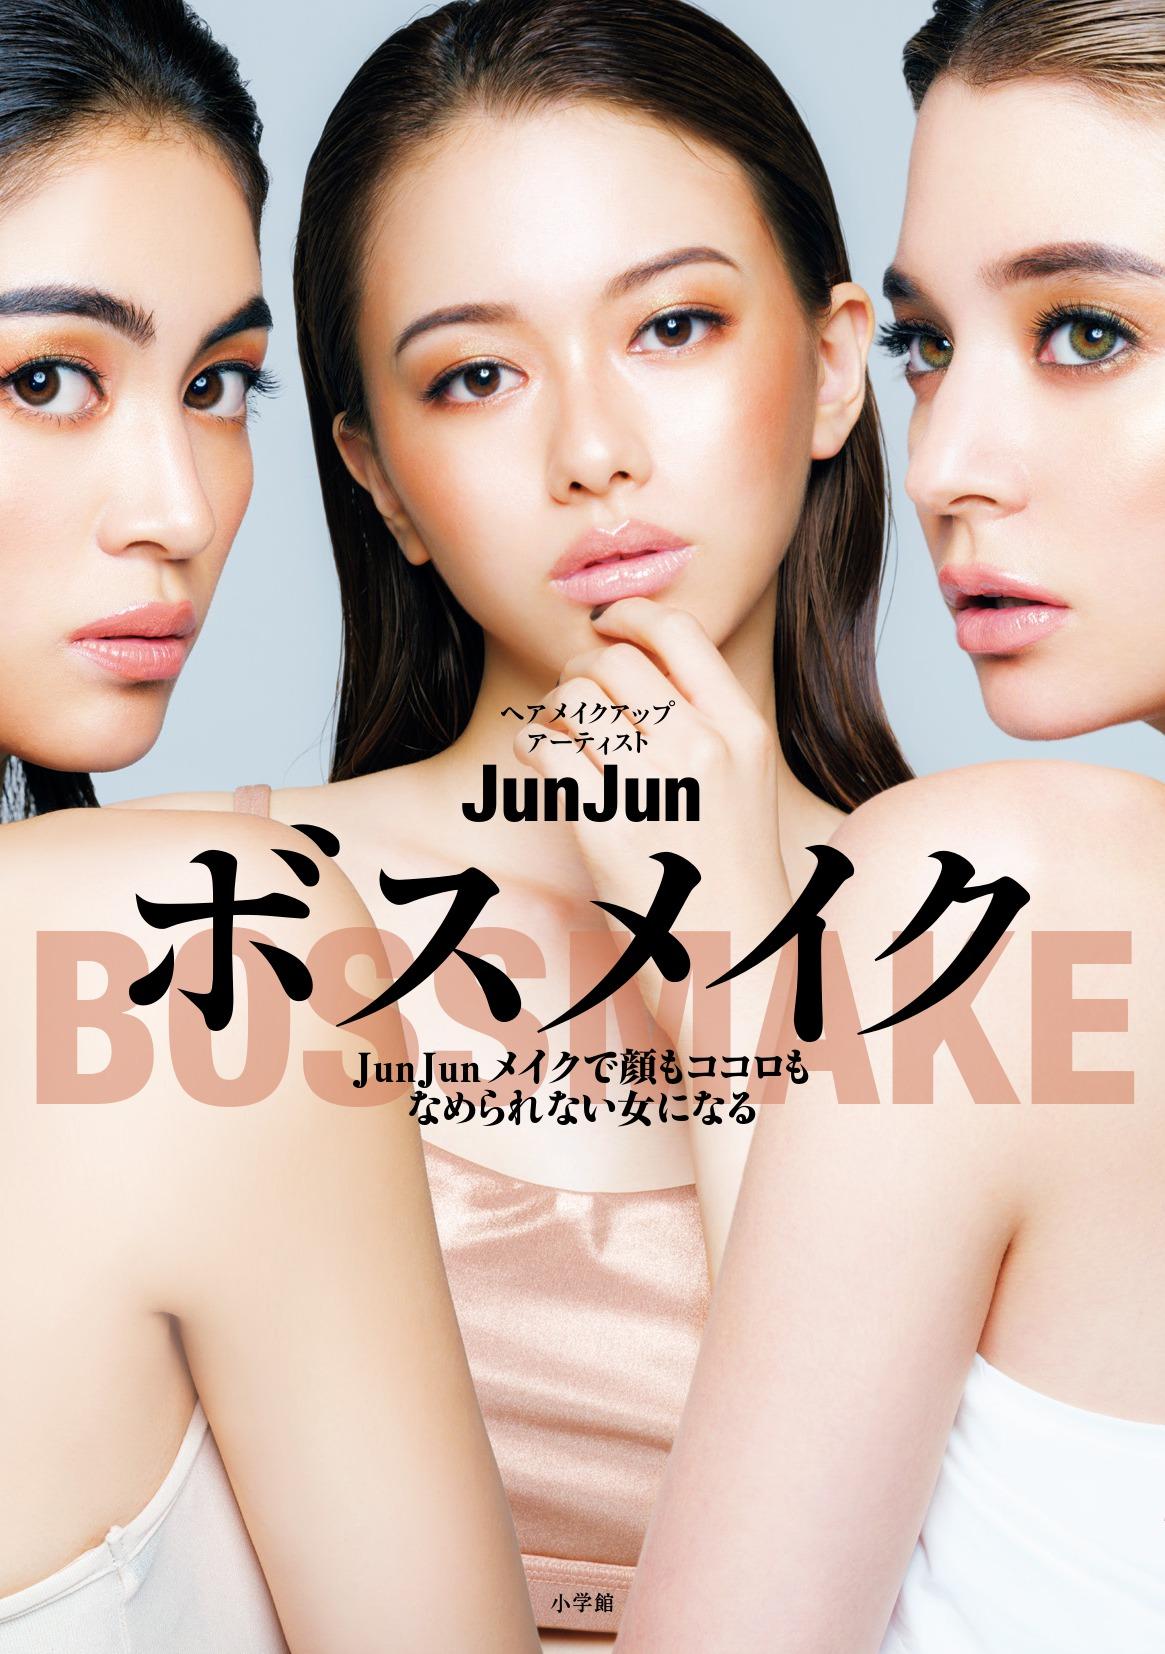 JunJun BOSSMAKE Tour 2019 4月6日(土)熊本公演